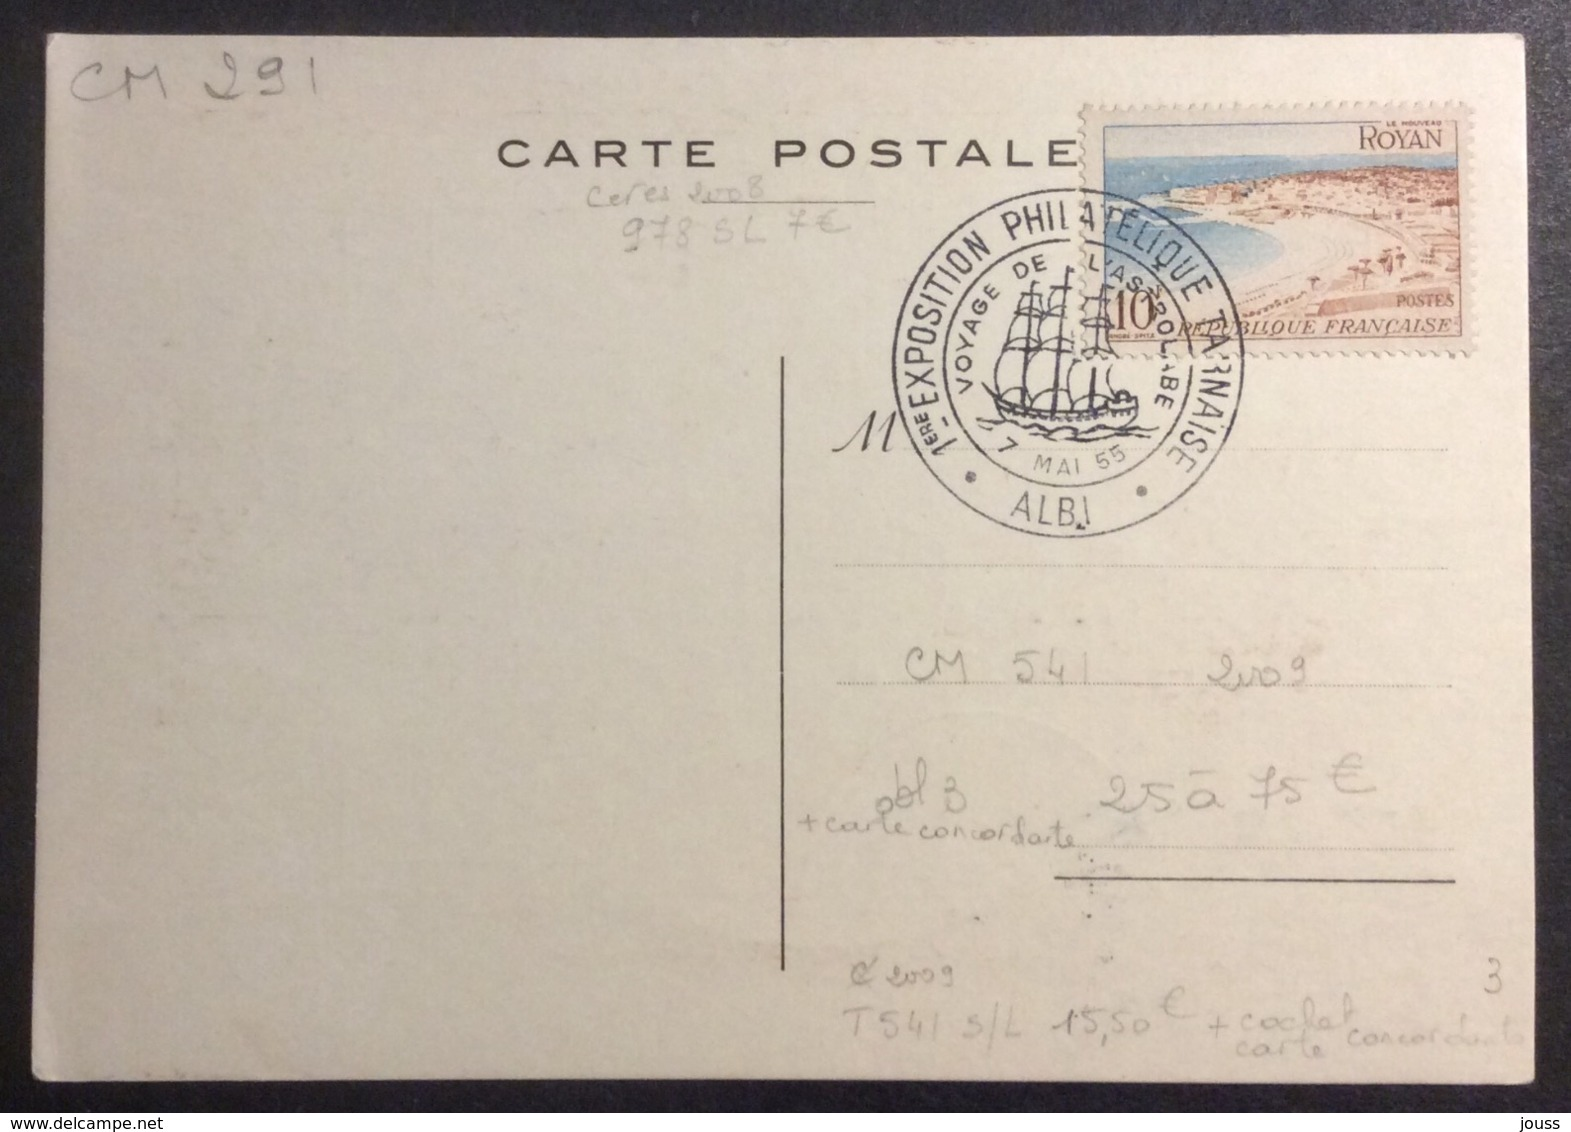 CM291 Carte Maximum Lapérouse Albi Exposition Philatélique Tarnaise Voyage Astrolabe 7/5/1955 - Cartes-Maximum